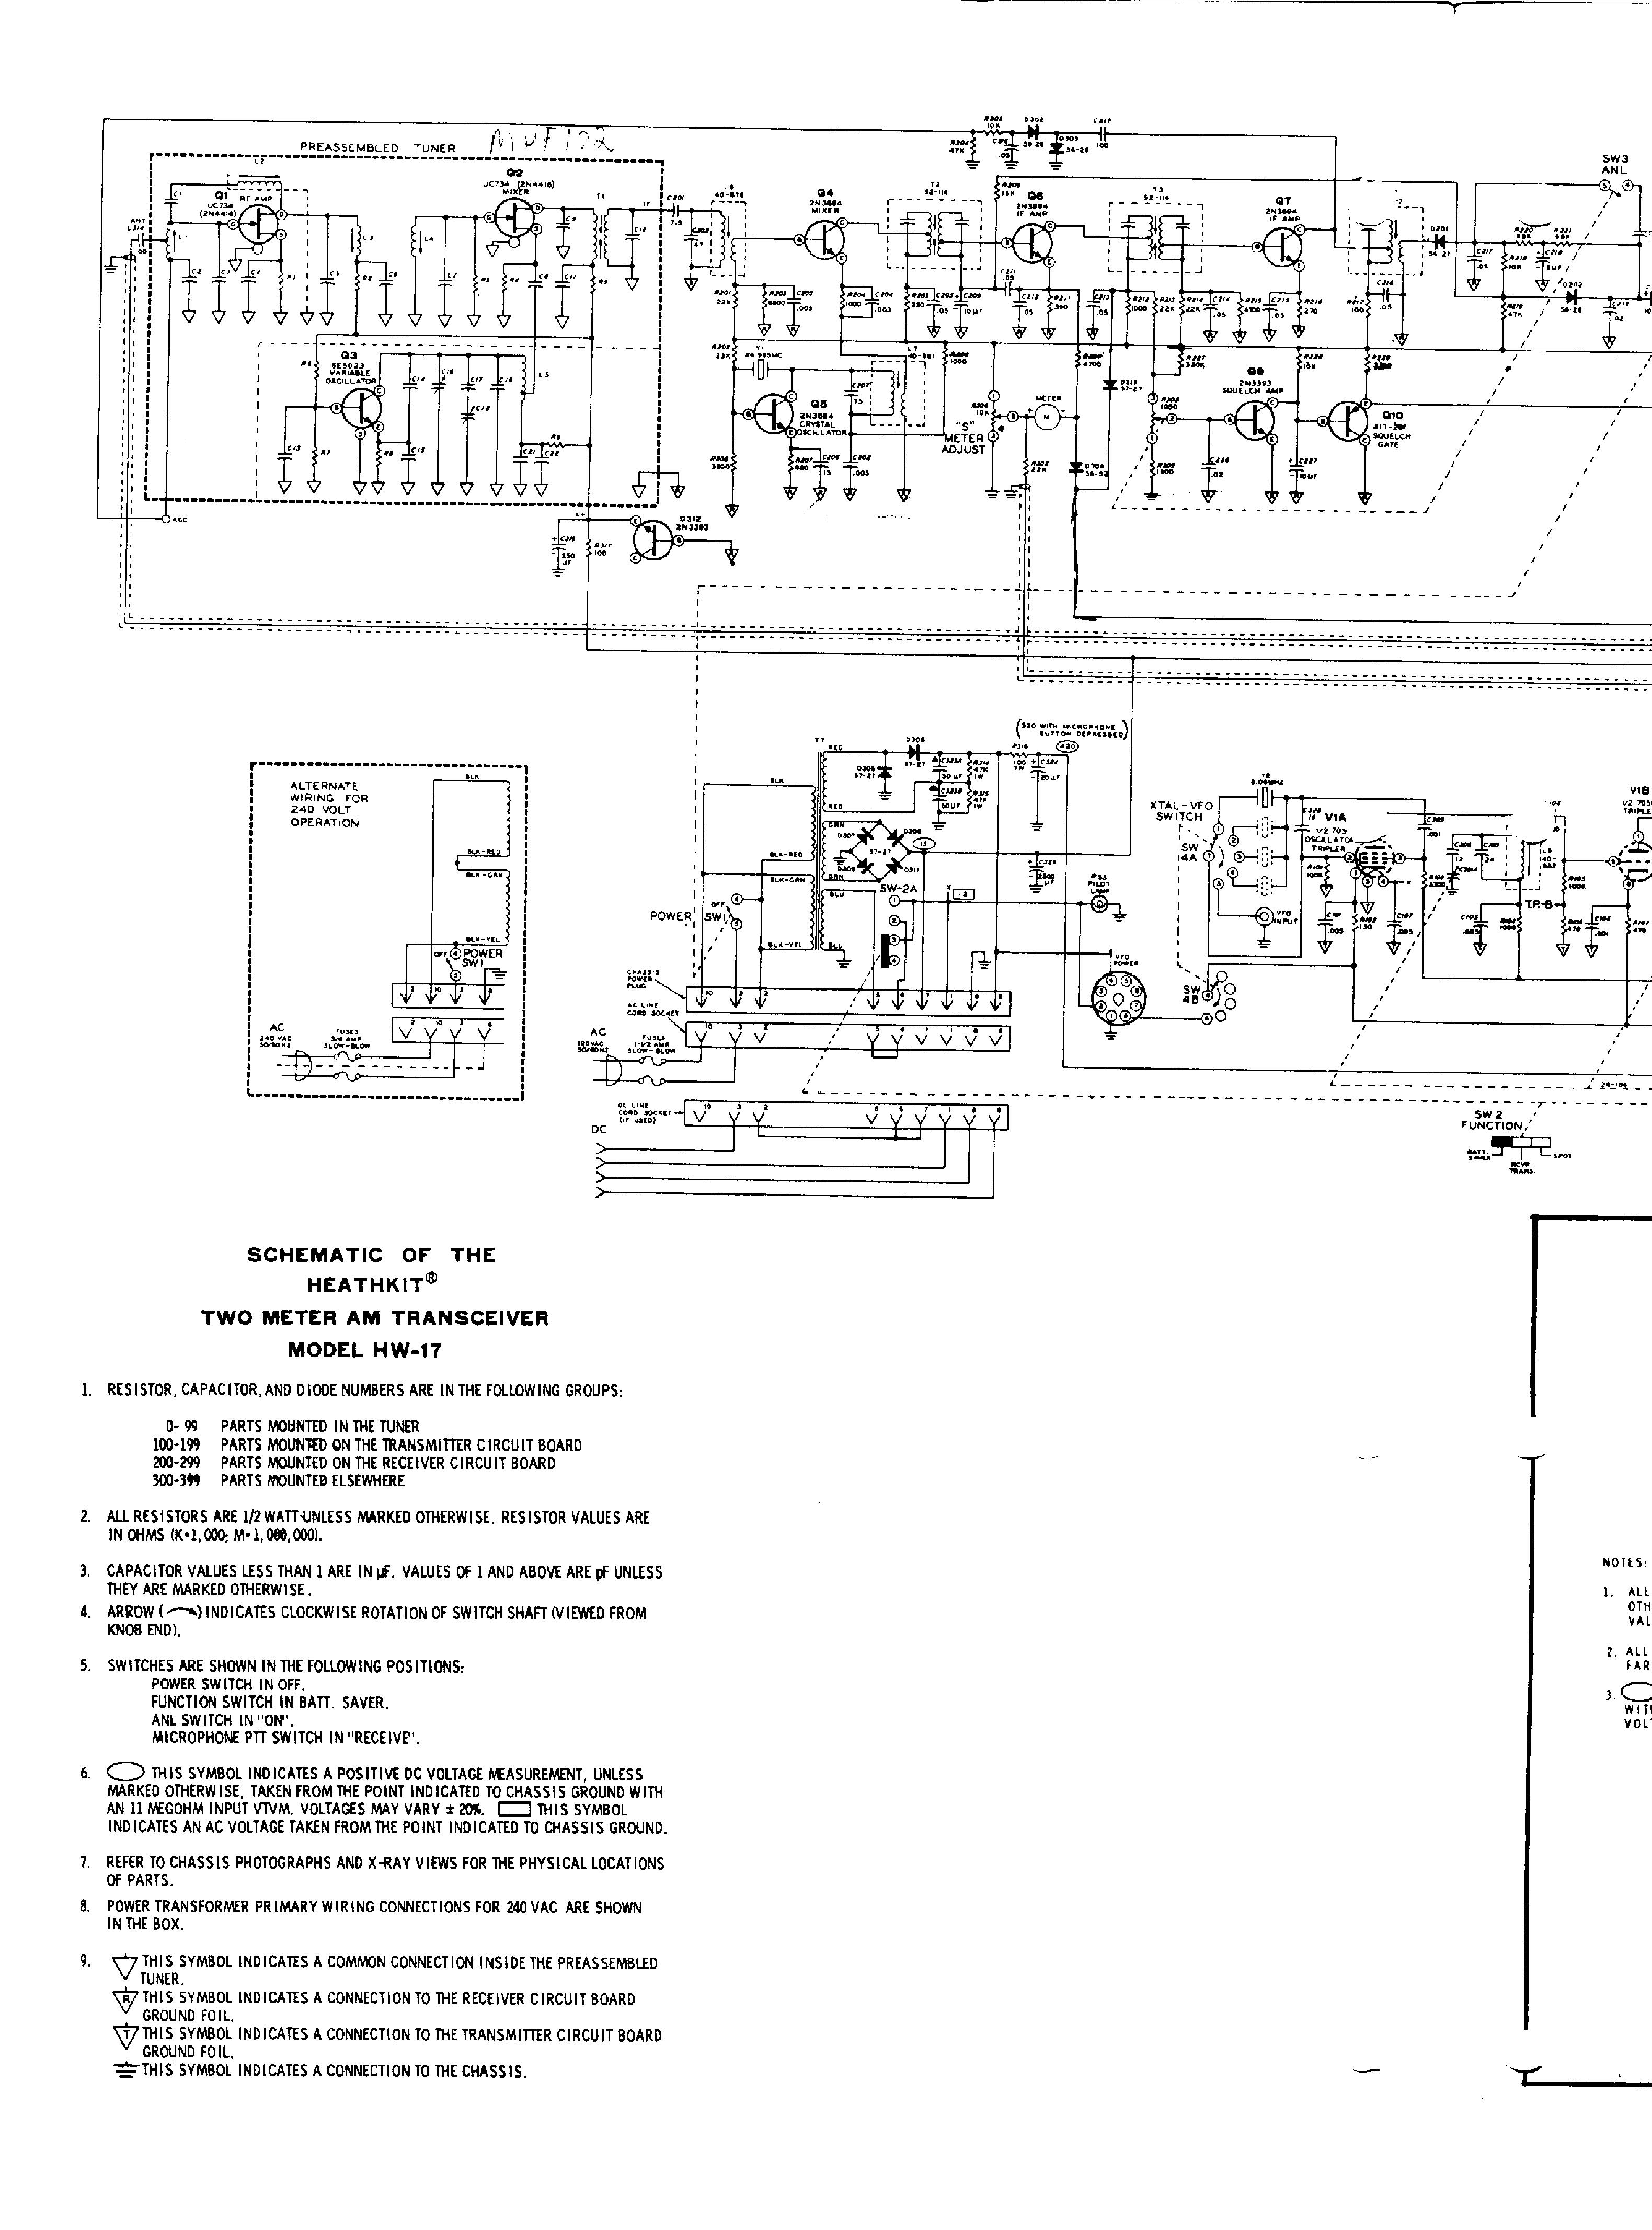 Heathkit Hw 17 Two Meter Am Transceiver Sch Service Manual Download